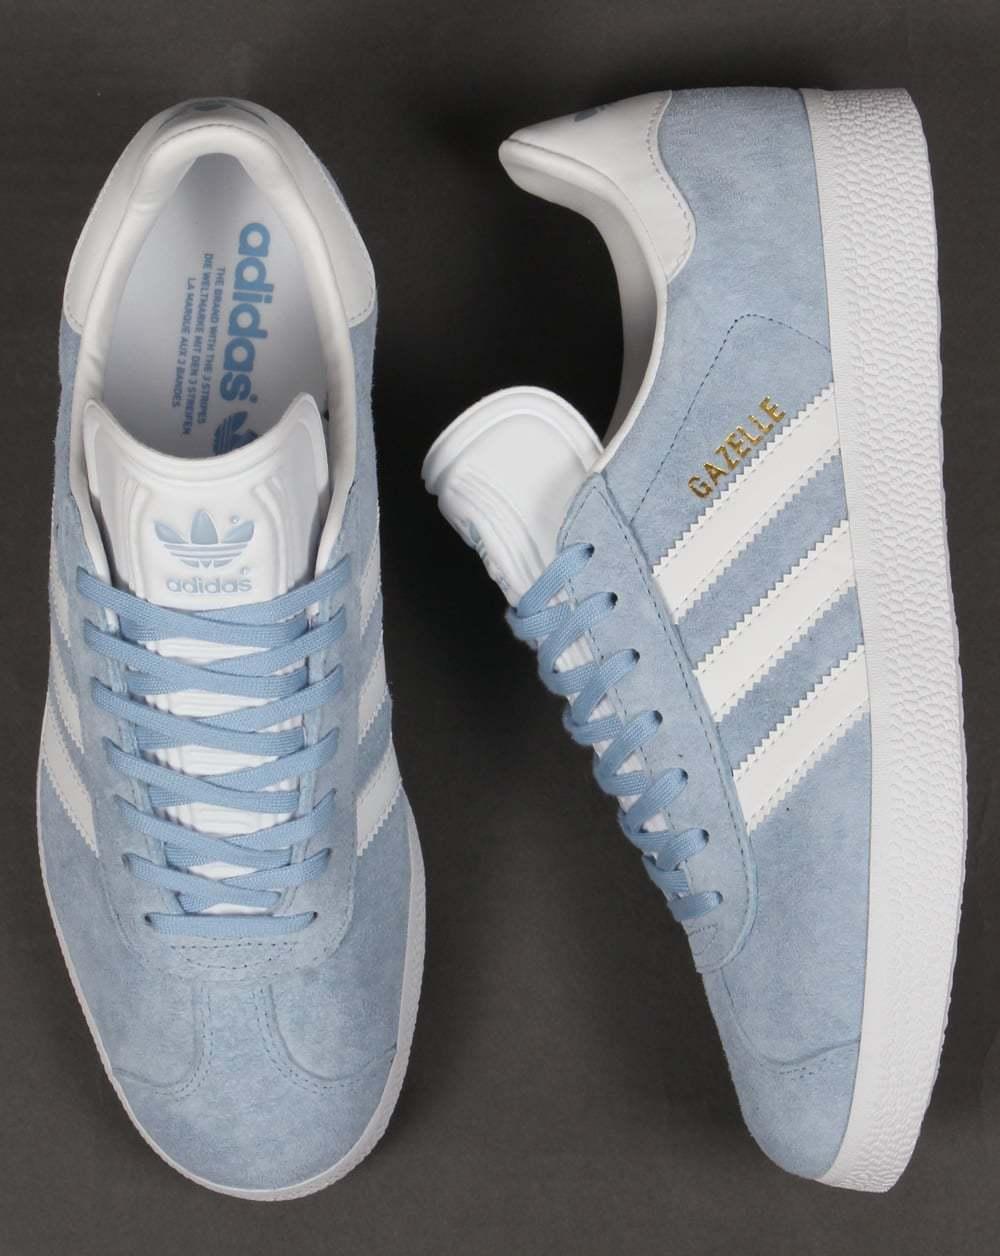 Adidas originale cielo gazzella 13 luce blu cielo originale bambino oro bianco zio argentina bb5481 d5e154